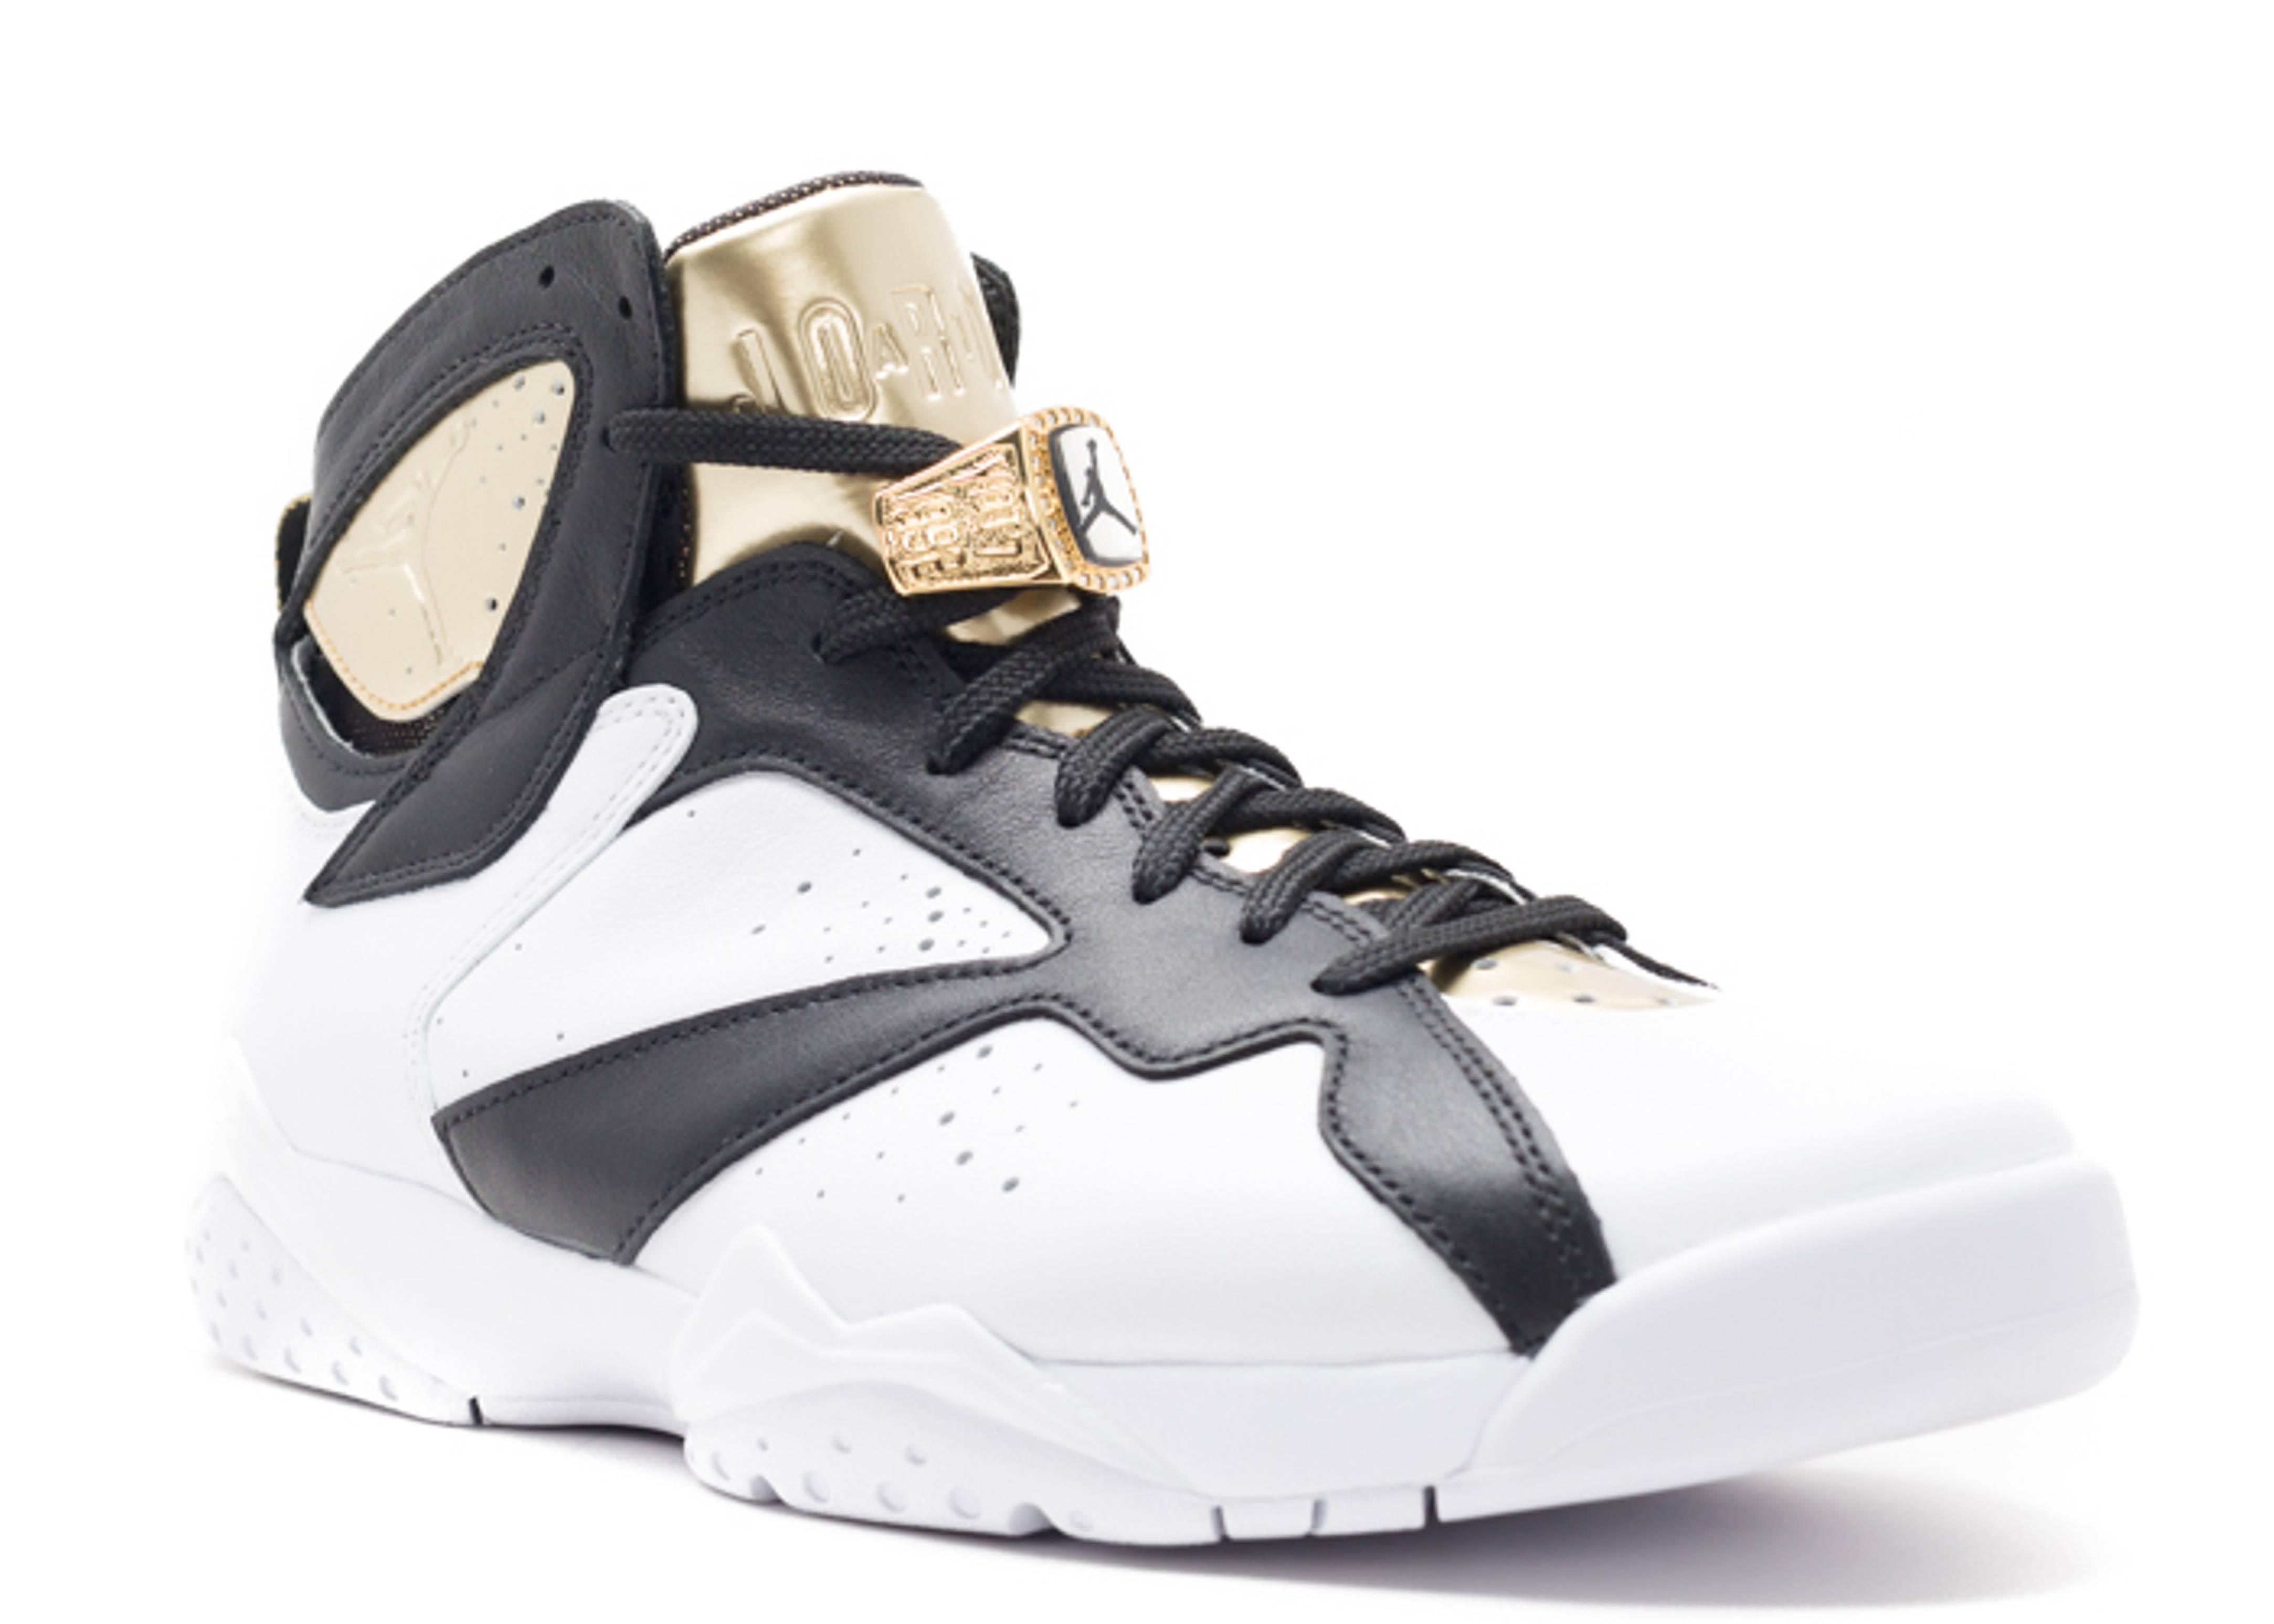 75fd71ee23da6b jordan retro 7 gold and black